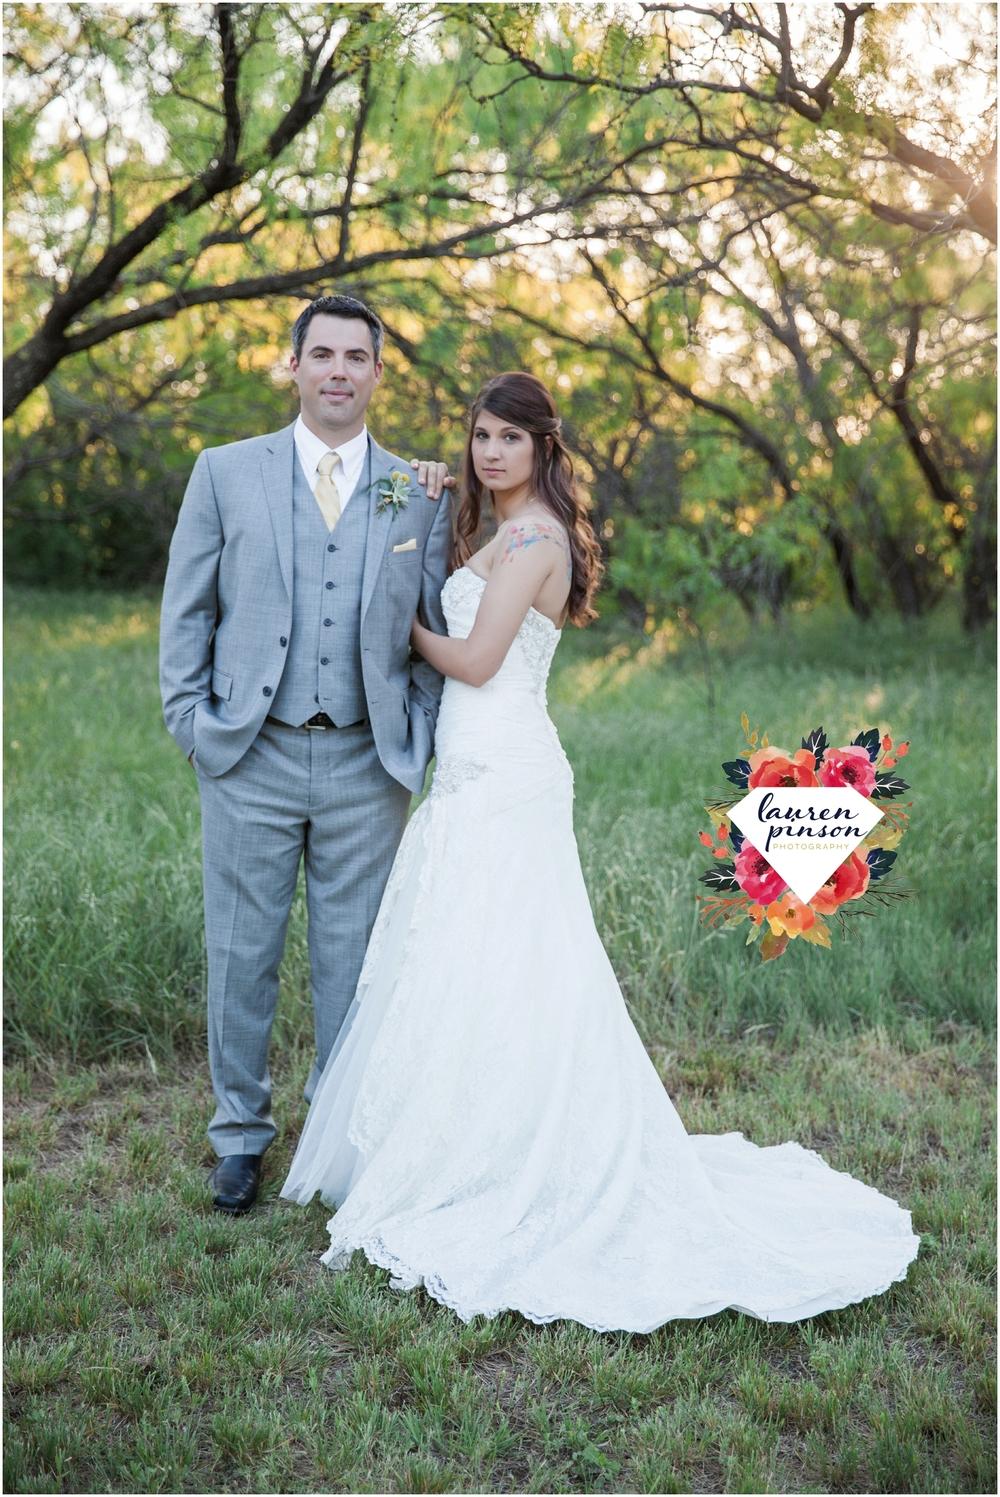 wichita-falls-wedding-photographer-oklahoma-wichita-mountains-bridal-session-bridals-photography_0765.jpg